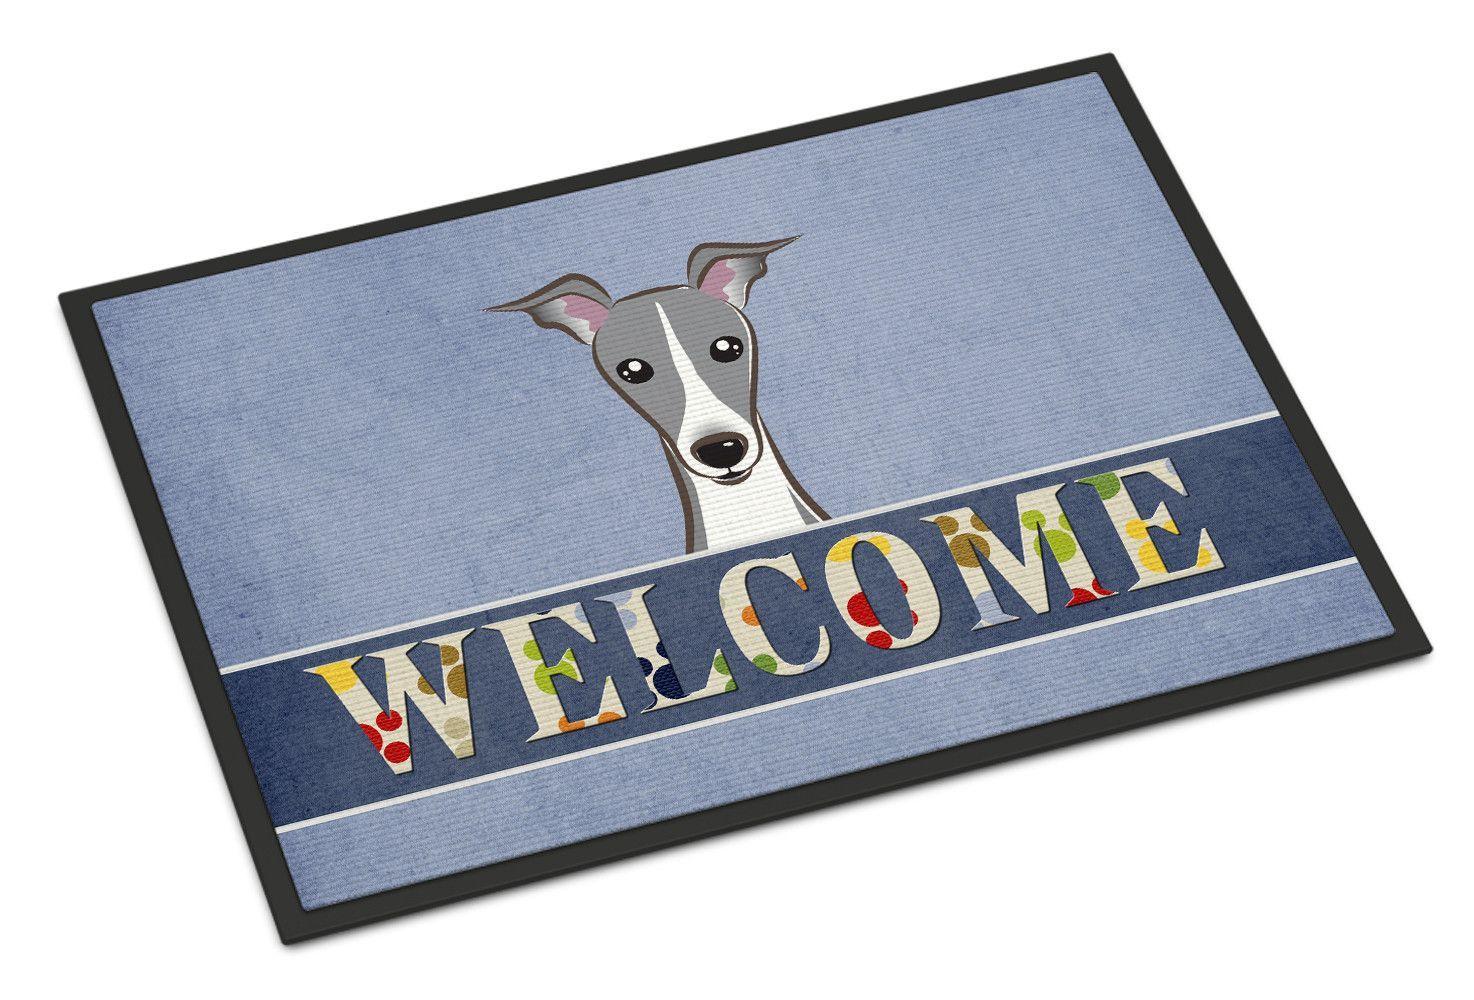 Italian Greyhound Welcome Indoor or Outdoor Mat 18x27 BB1422MAT